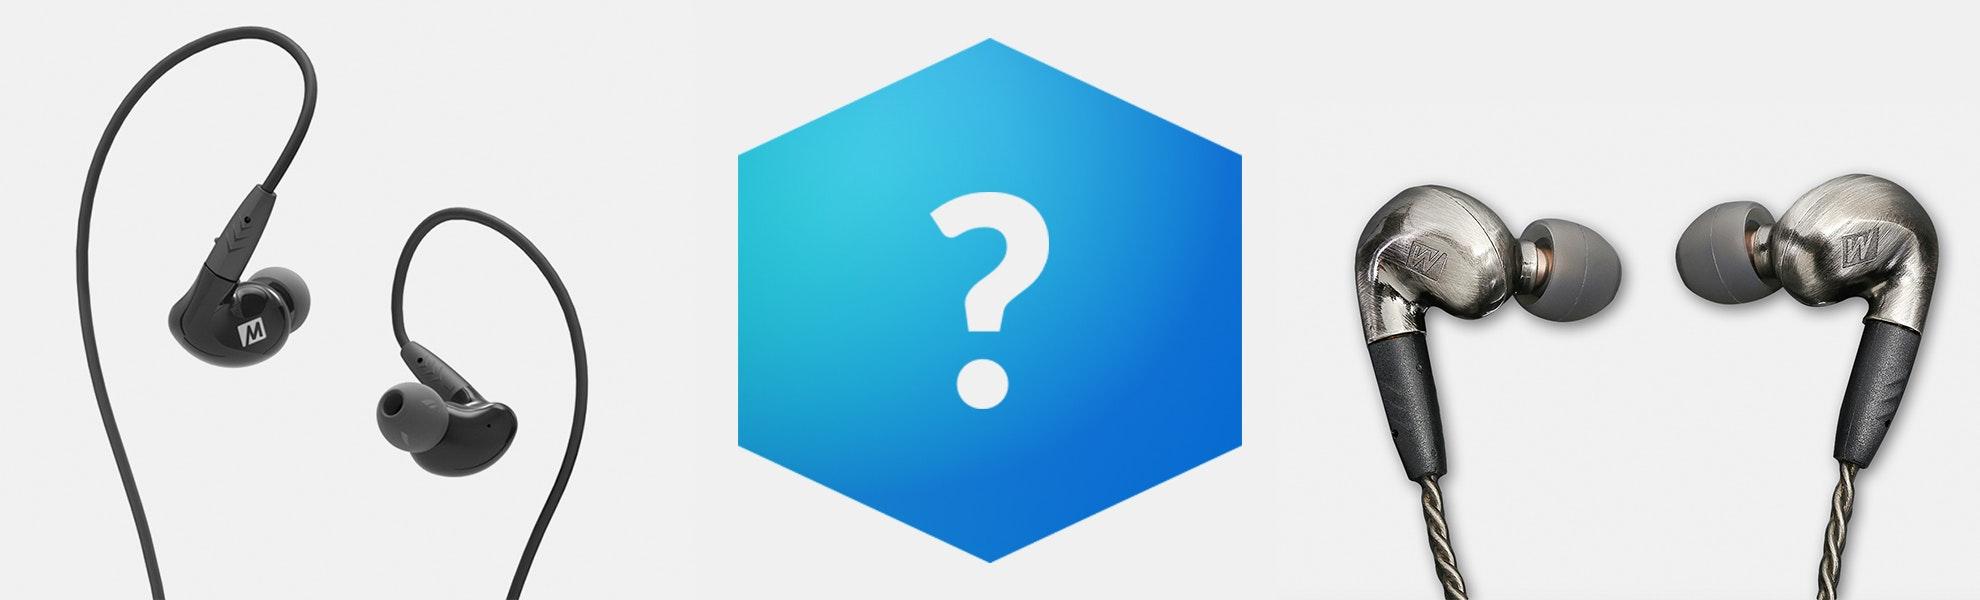 MEE Audio Pinnacle Blue Box